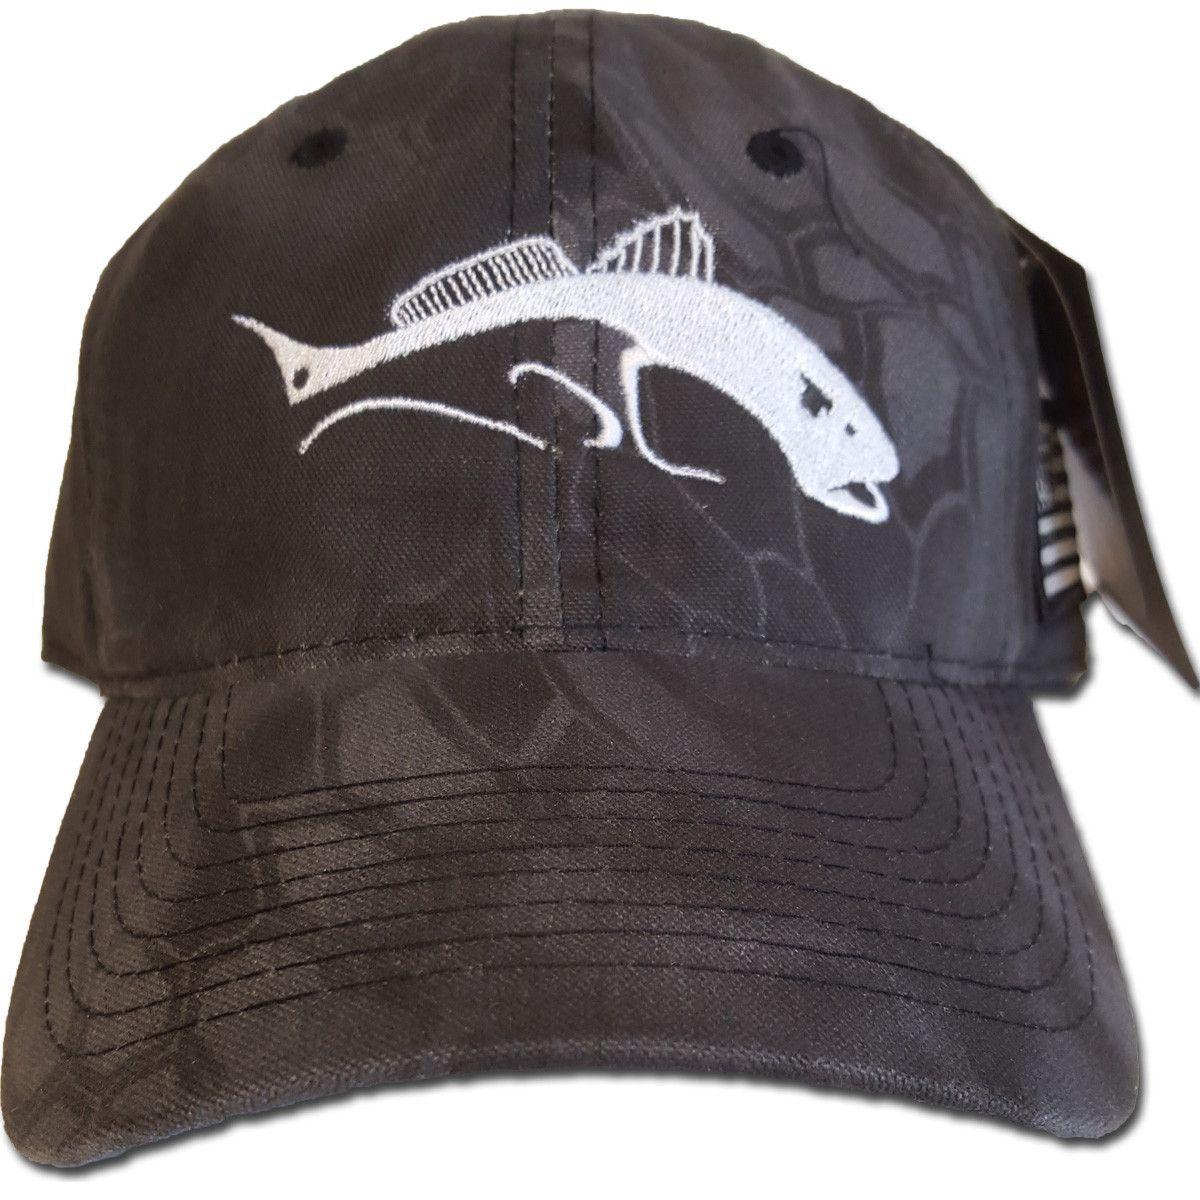 Redfish Fishing Hat On Kryptek Black Camo For My Fella Pinterest